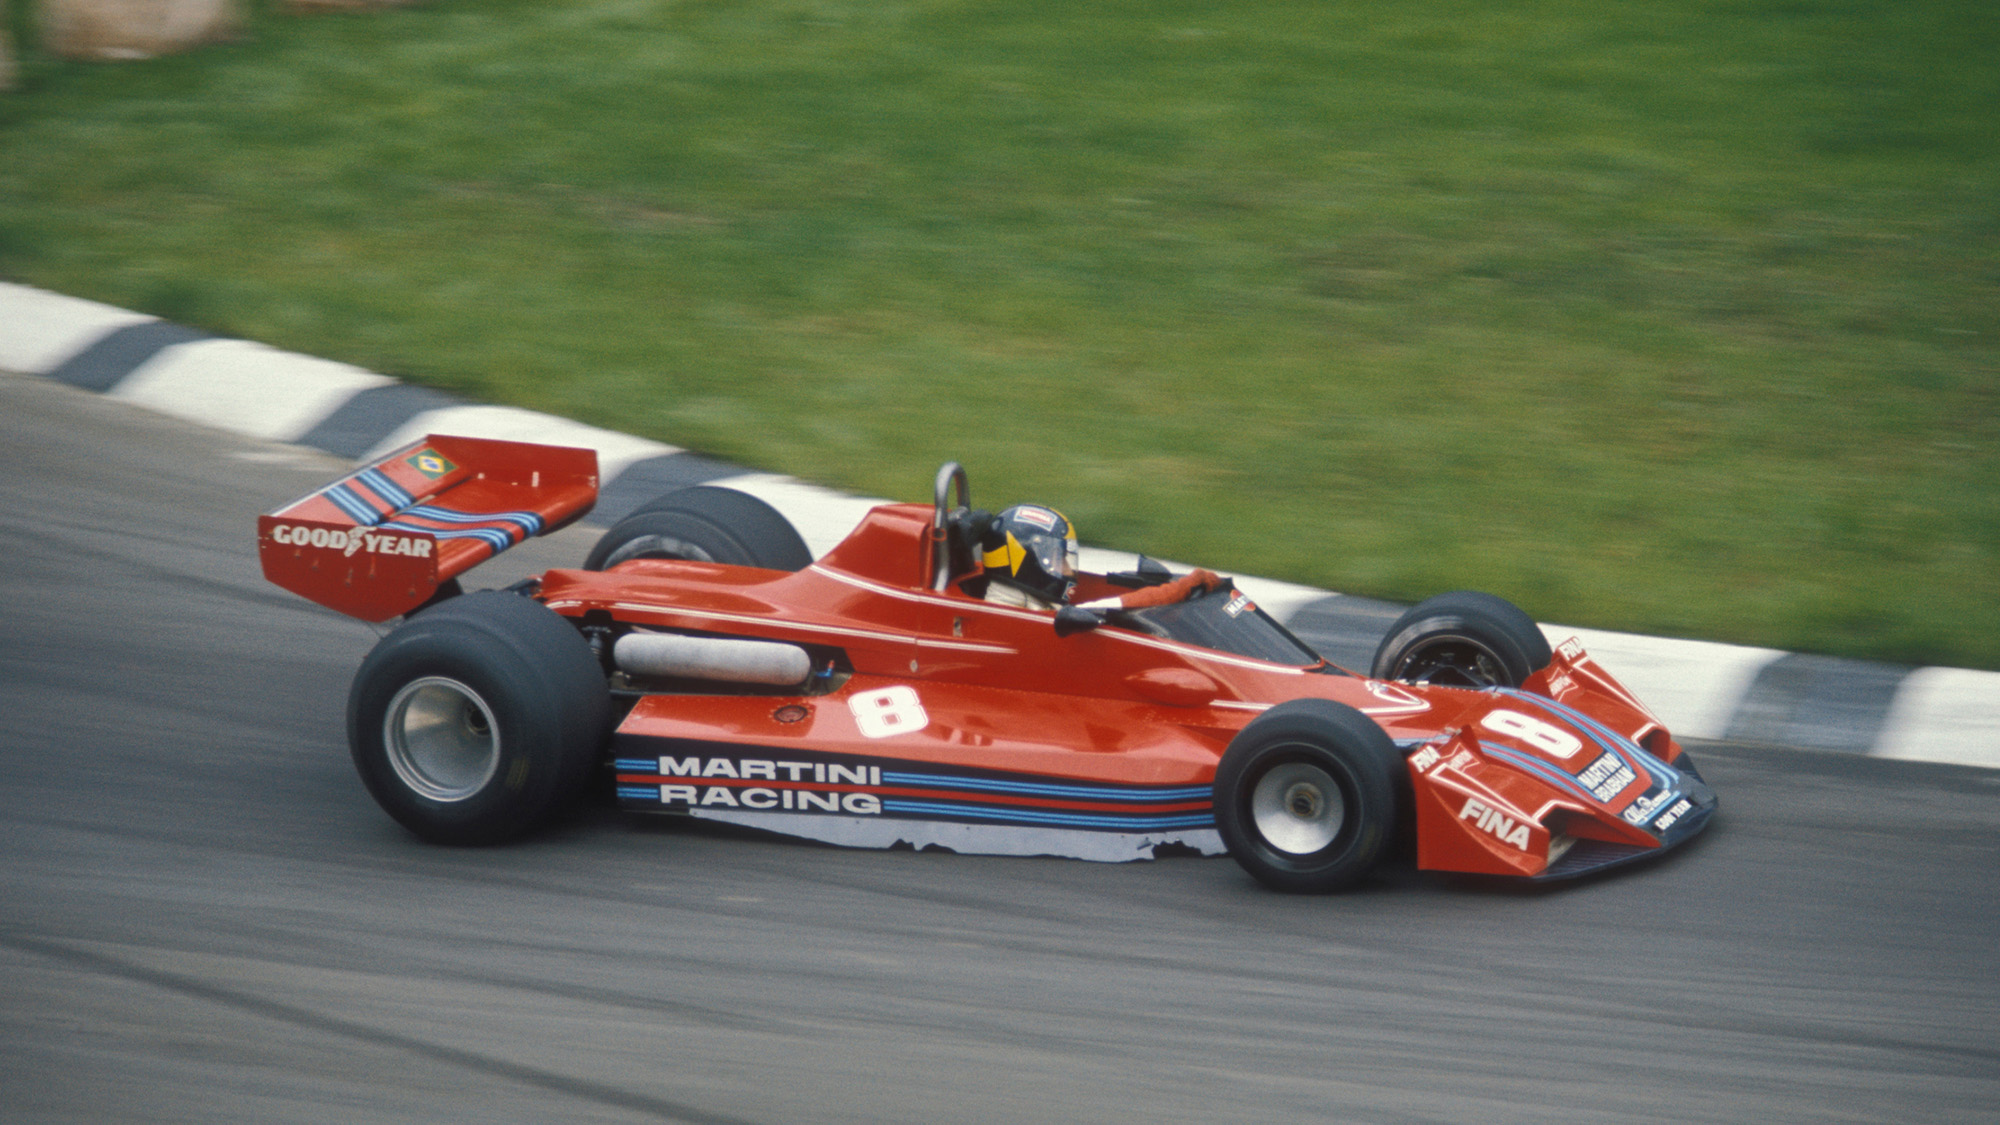 Carlos Pace in the Brabham Alfa Romeo at the 1976 Italian Grand Prix